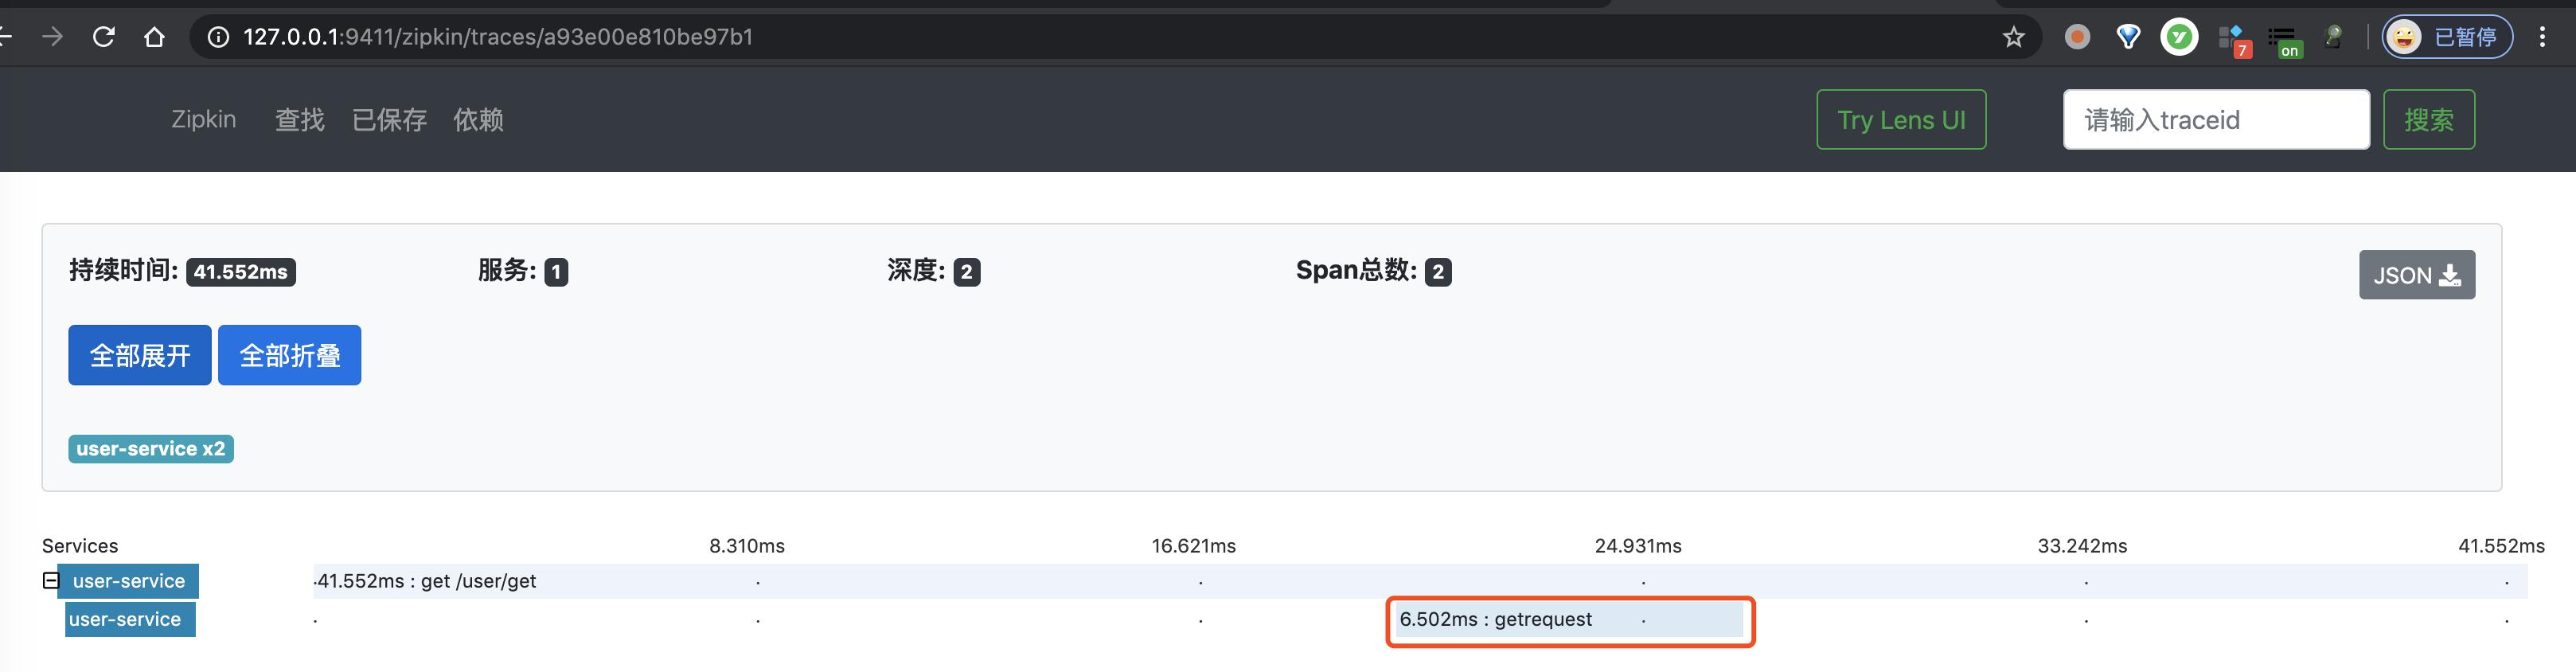 Zipkin UI —— 链路数据明细